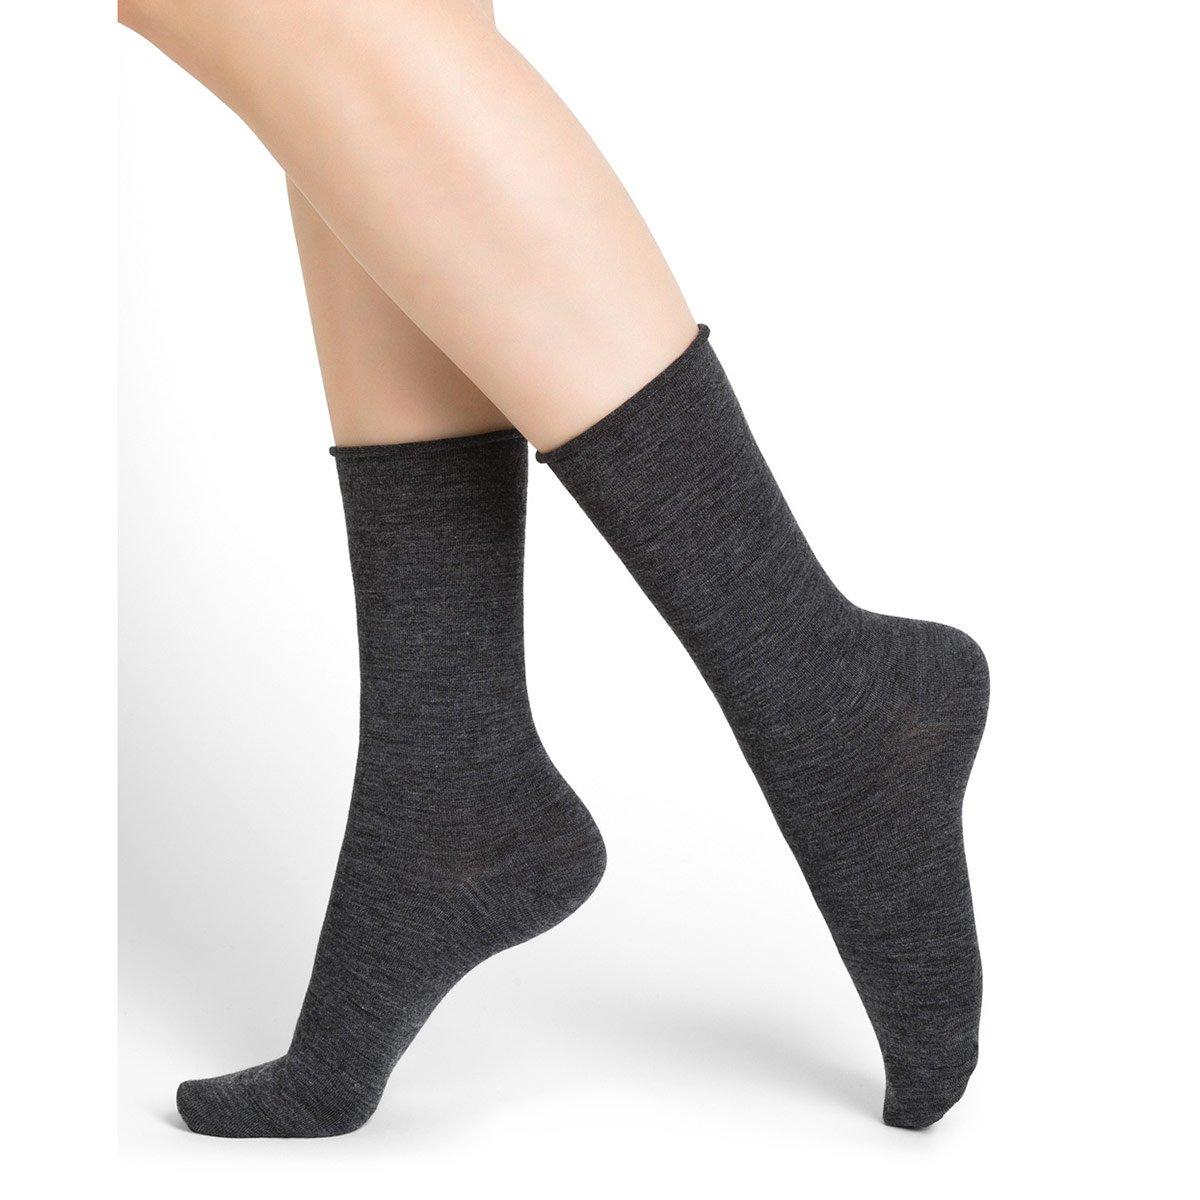 BLEUFORET | ladies socks wool cotton